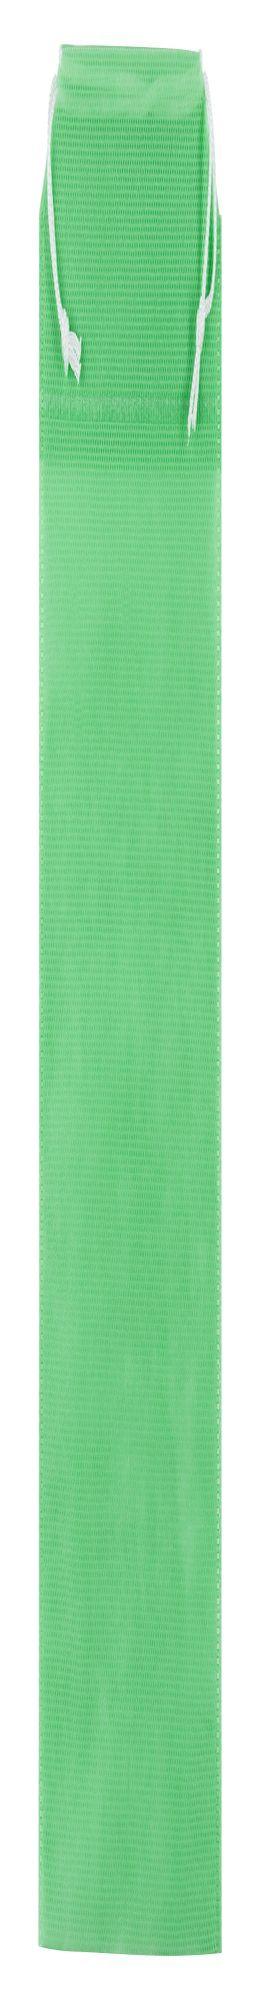 Пакет Smenka, зеленый фото